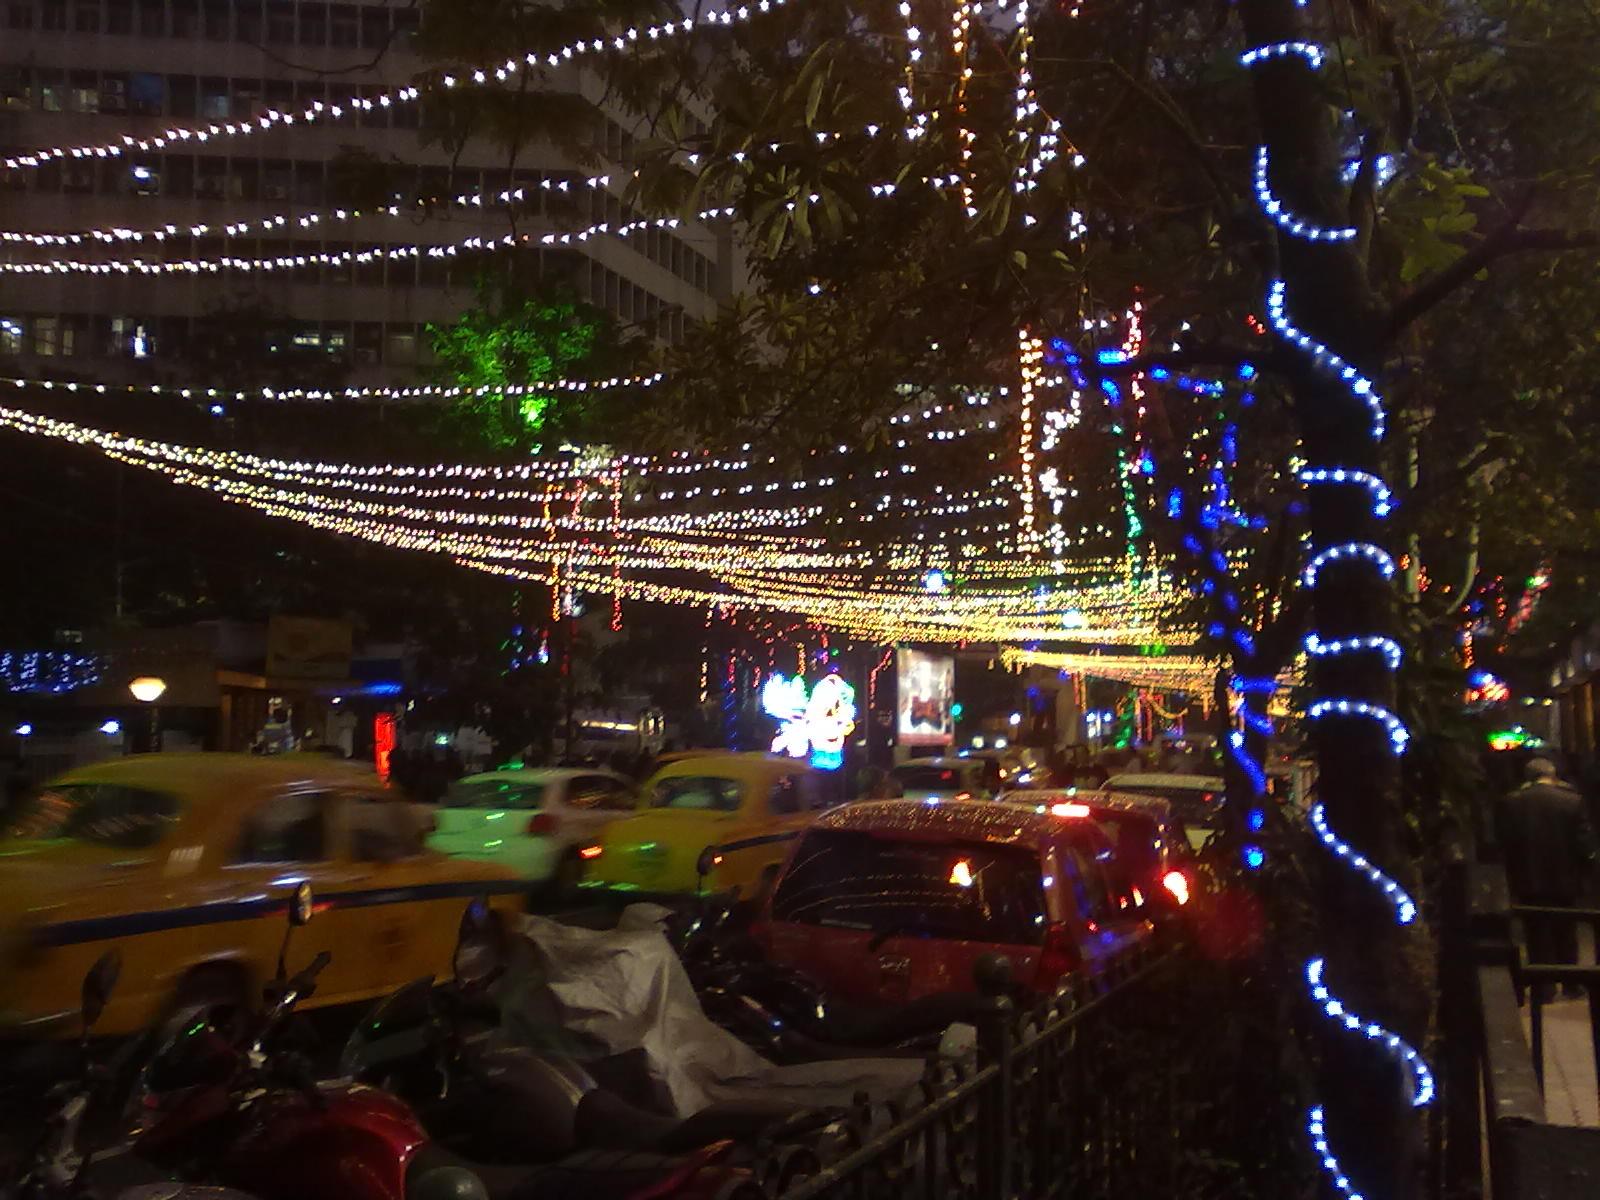 FileChristmas Lights Park Street Kolkatajpg  Wikimedia